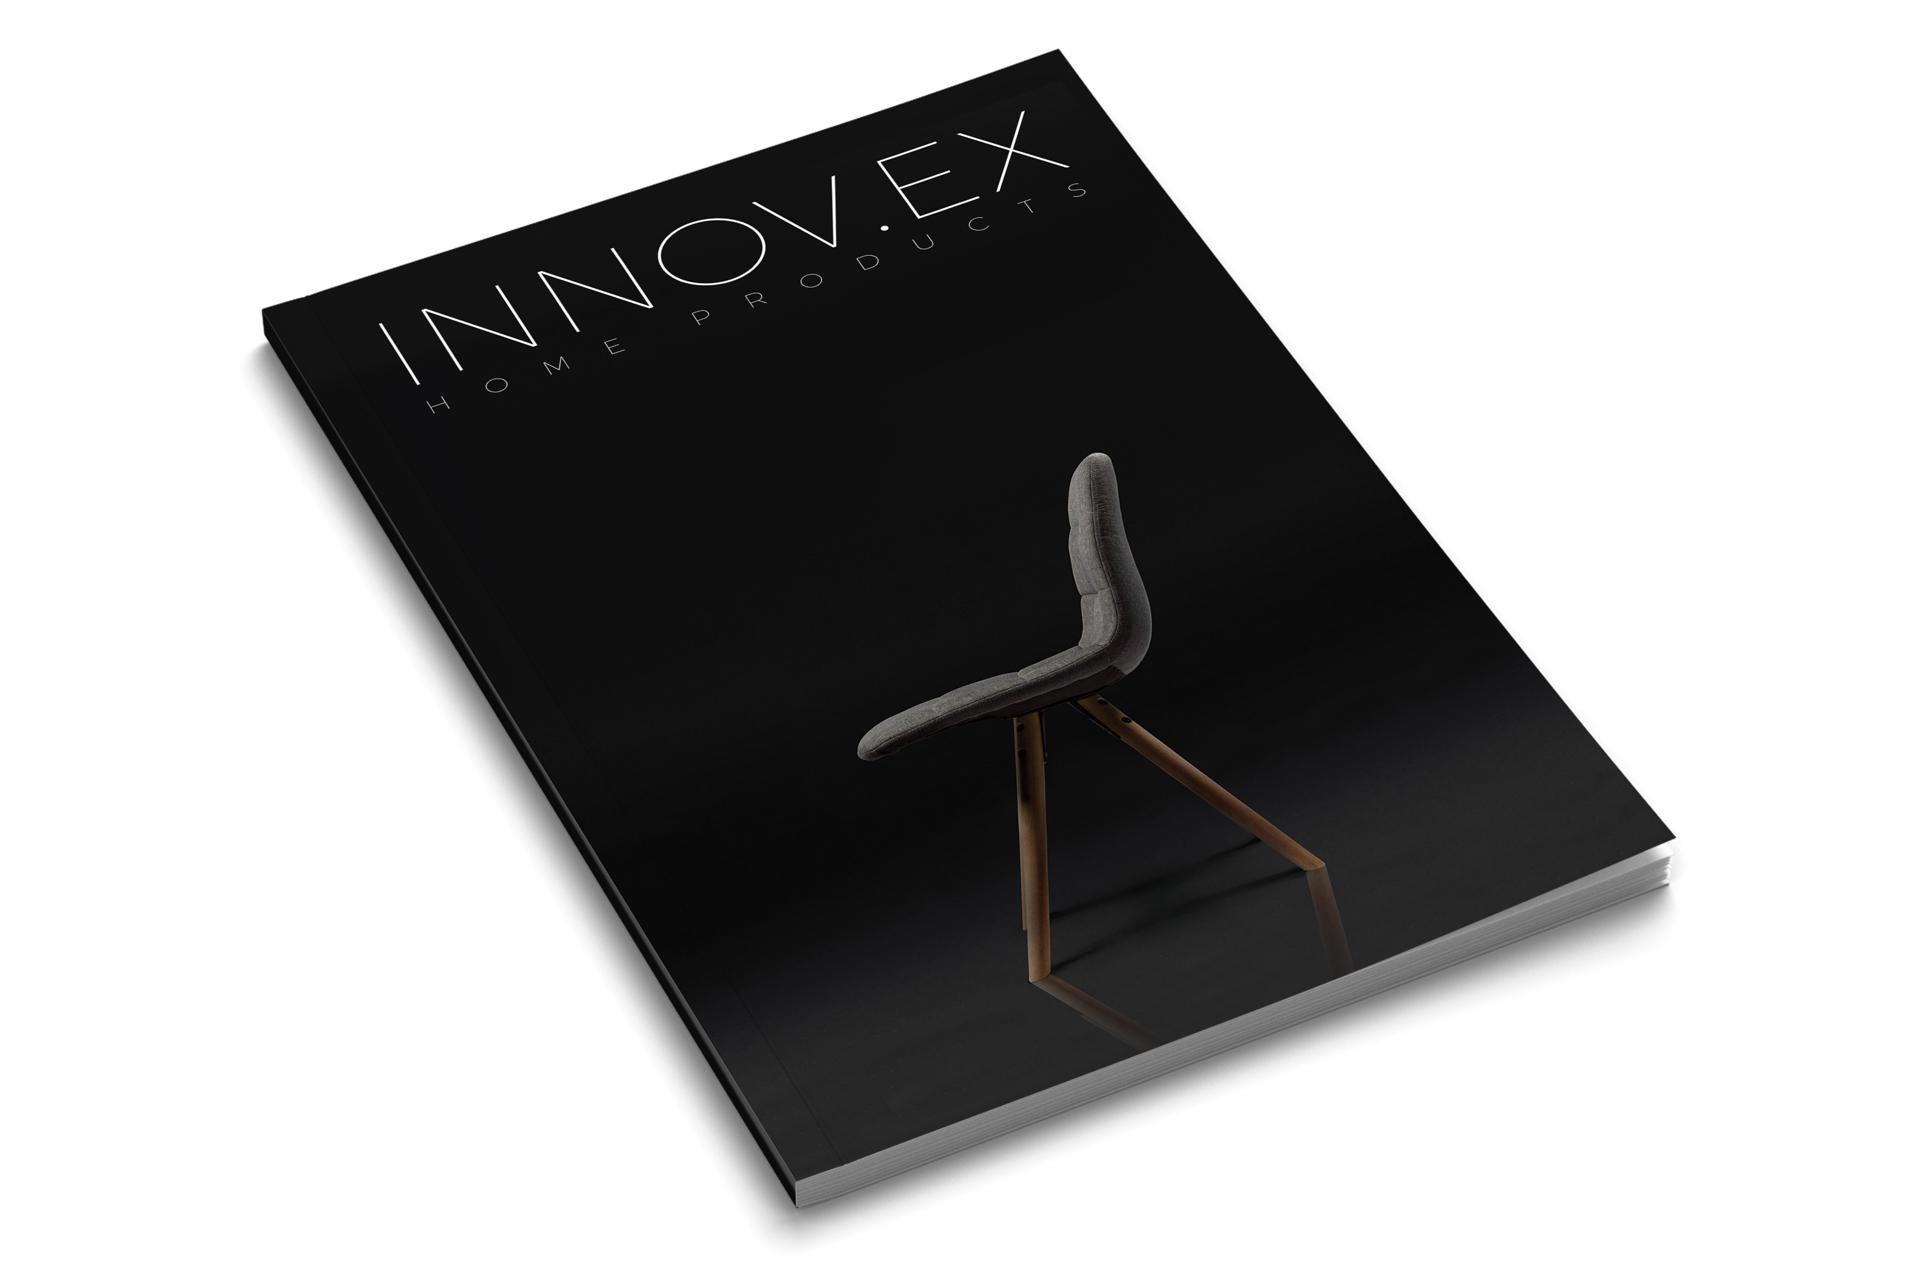 Innovex_landscape_2x3_02.jpg